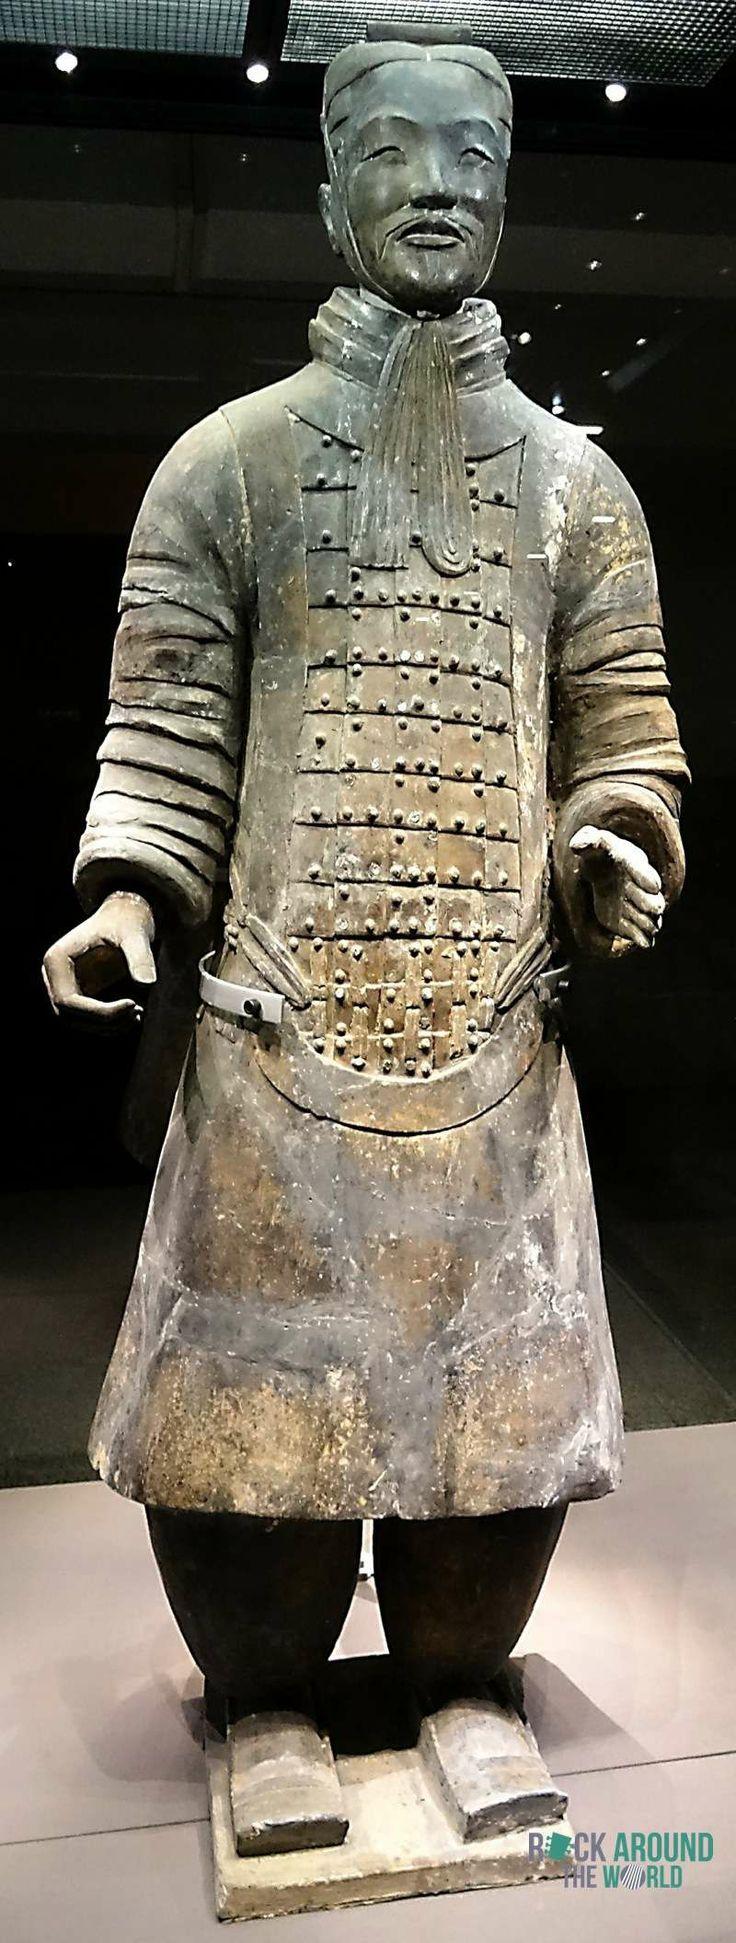 Rangmittlerer Offizier der Terrakotta Armee vom Kaiser Qín Shǐhuángdì in Halle 2 – Middle-ranking Officer of the Terracotta Warriors of the first emperor Qín Shǐhuángdì in Pit 2 in Xi'an, China